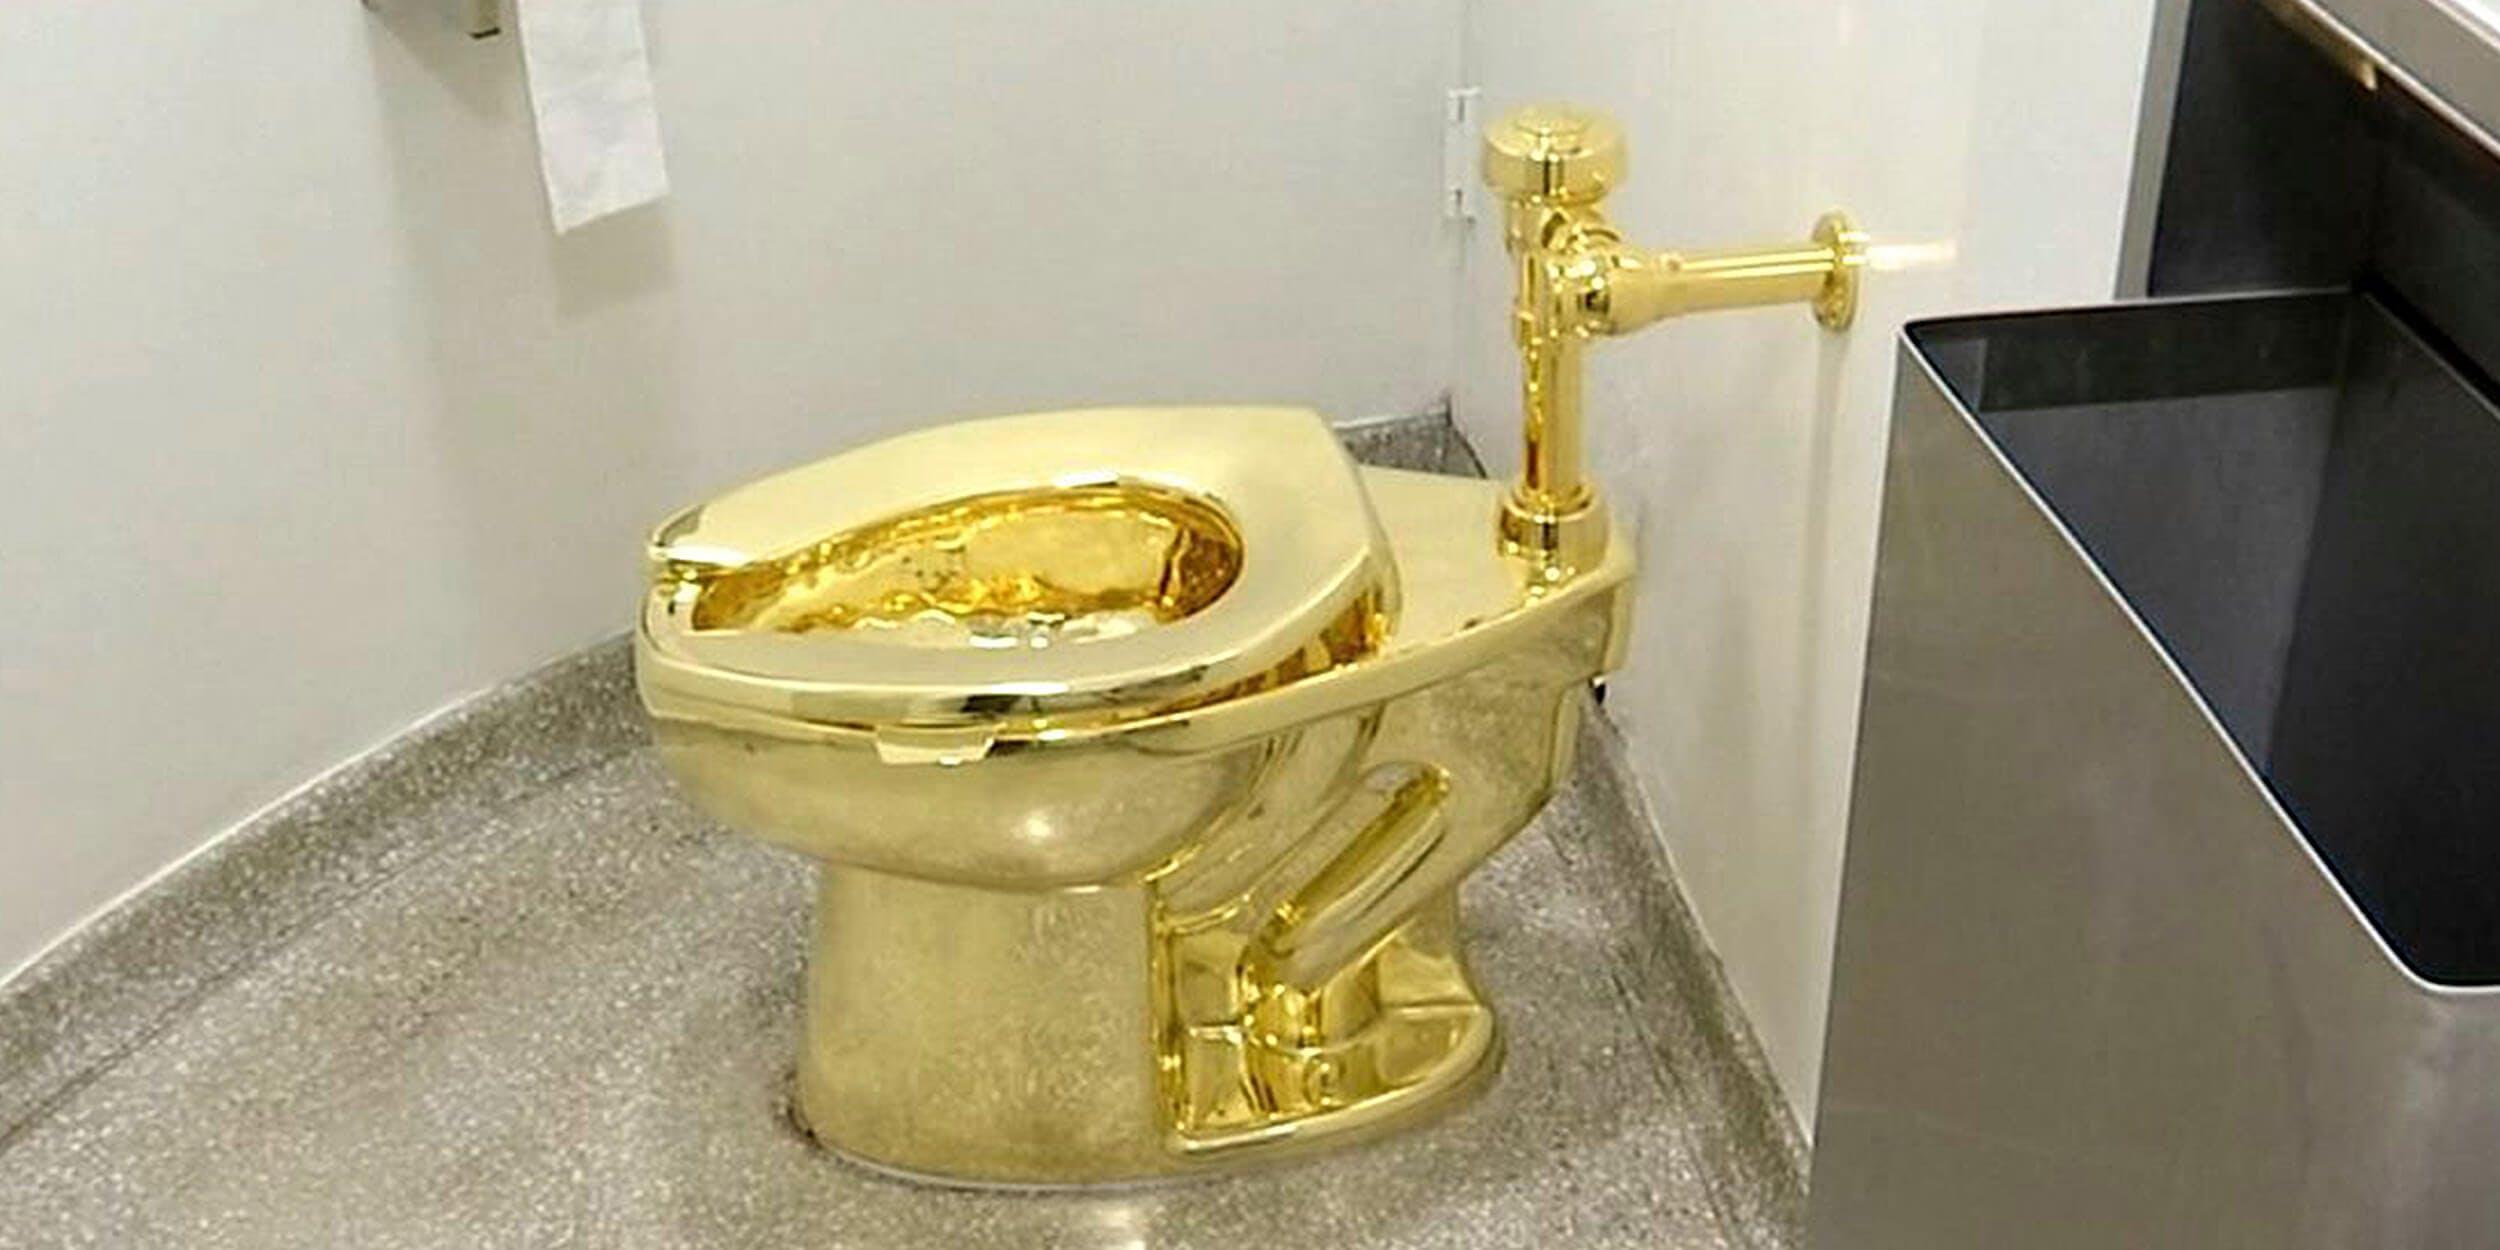 18-karat toilet, titled